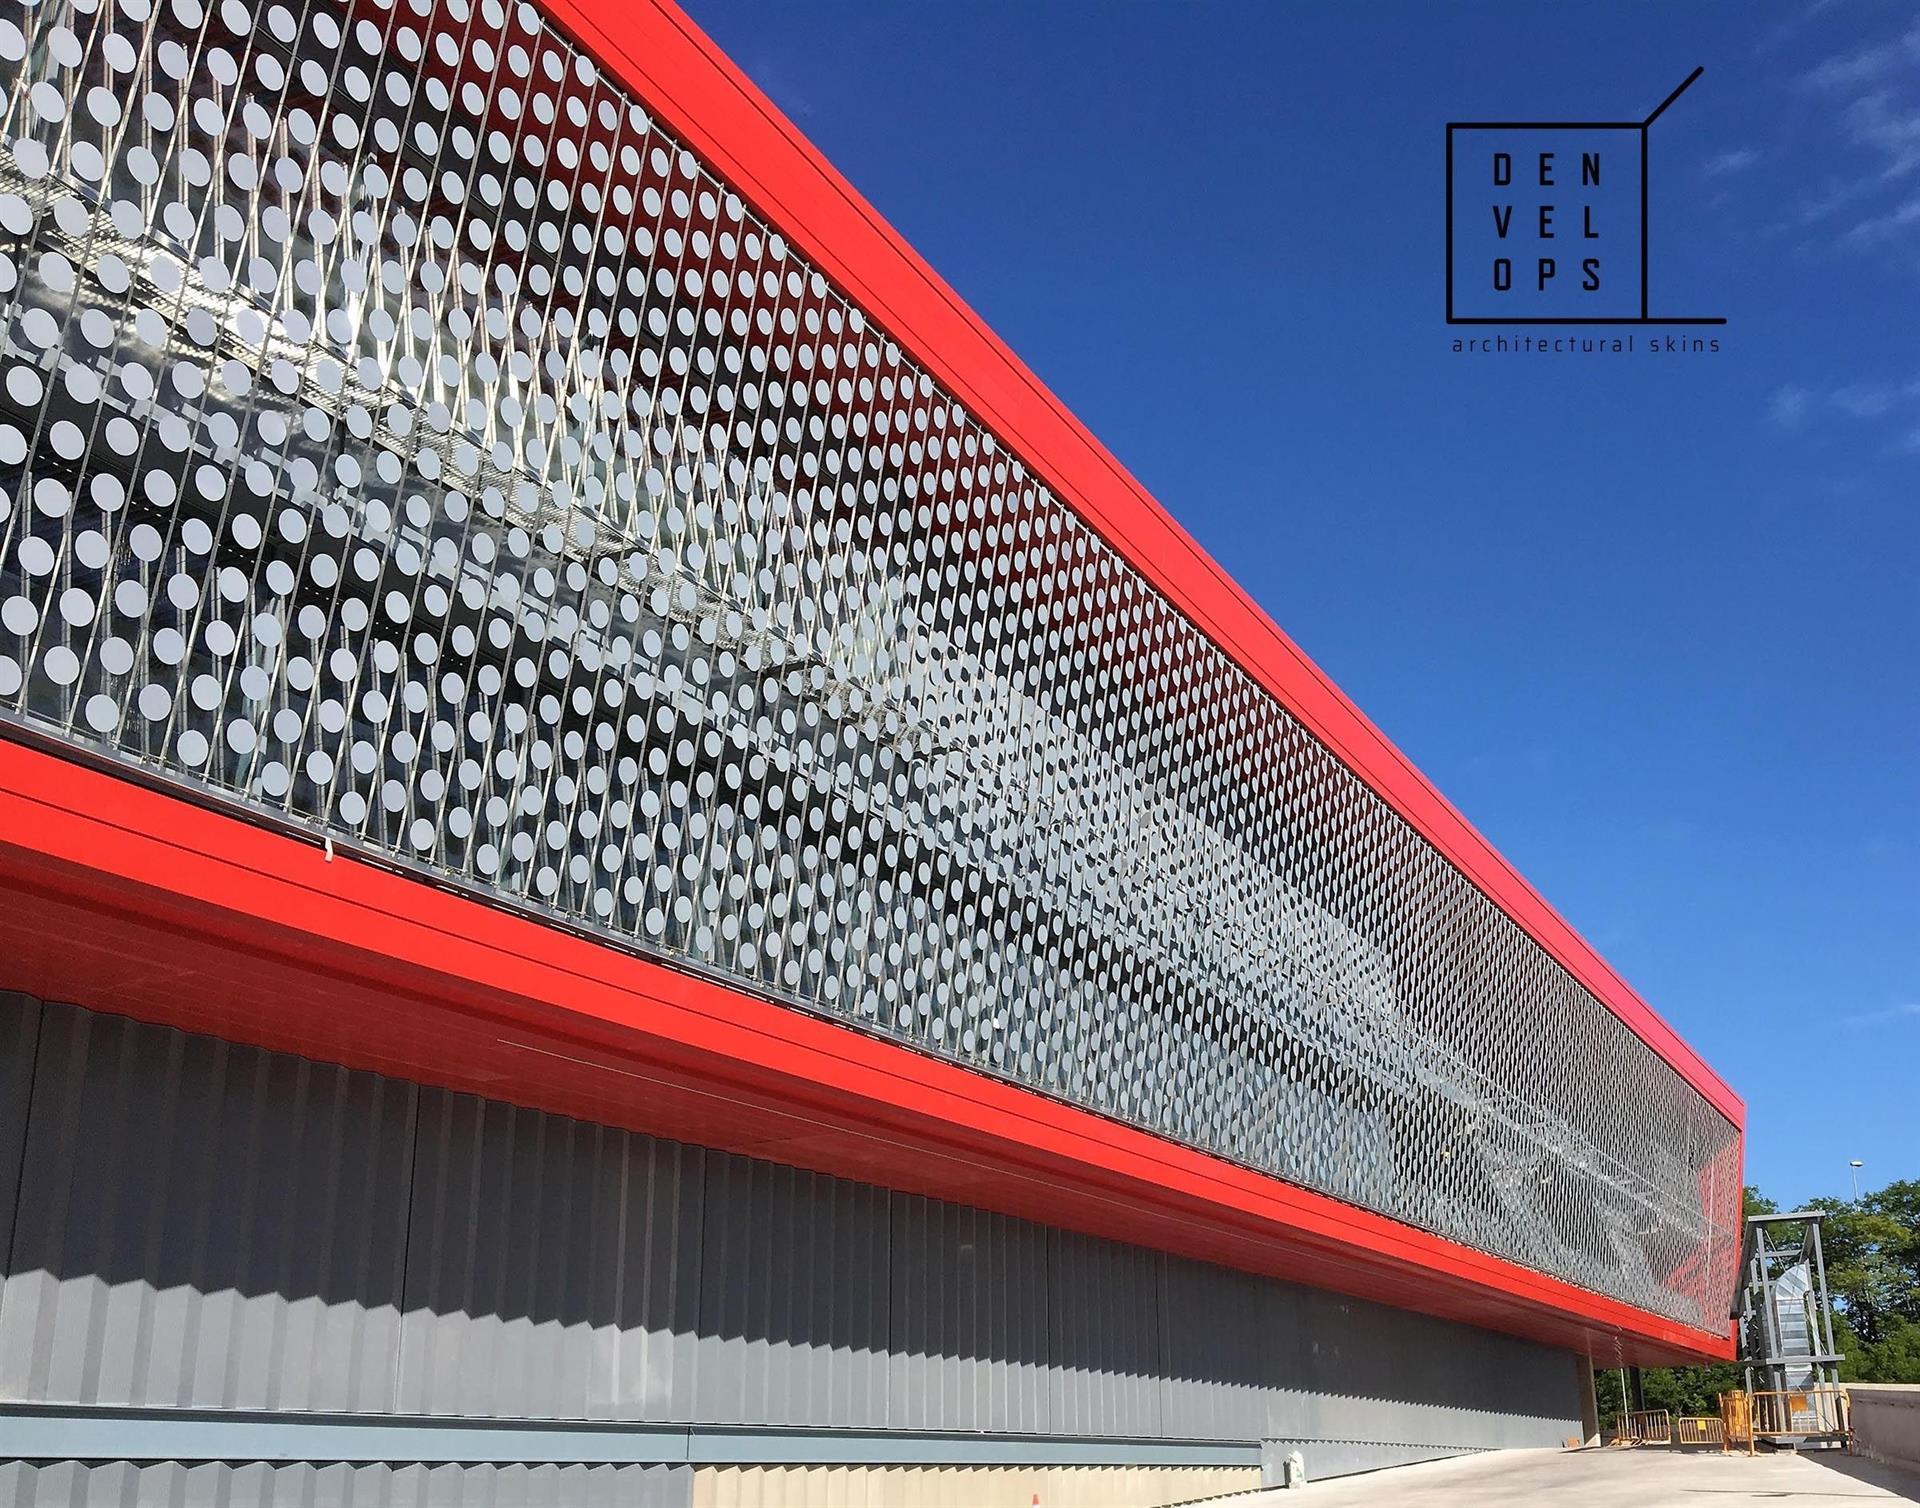 Fachada Dinámica Denvelops. Johan Cruyff Stadium. Batlle i Roig / Autor: Jaume Colom